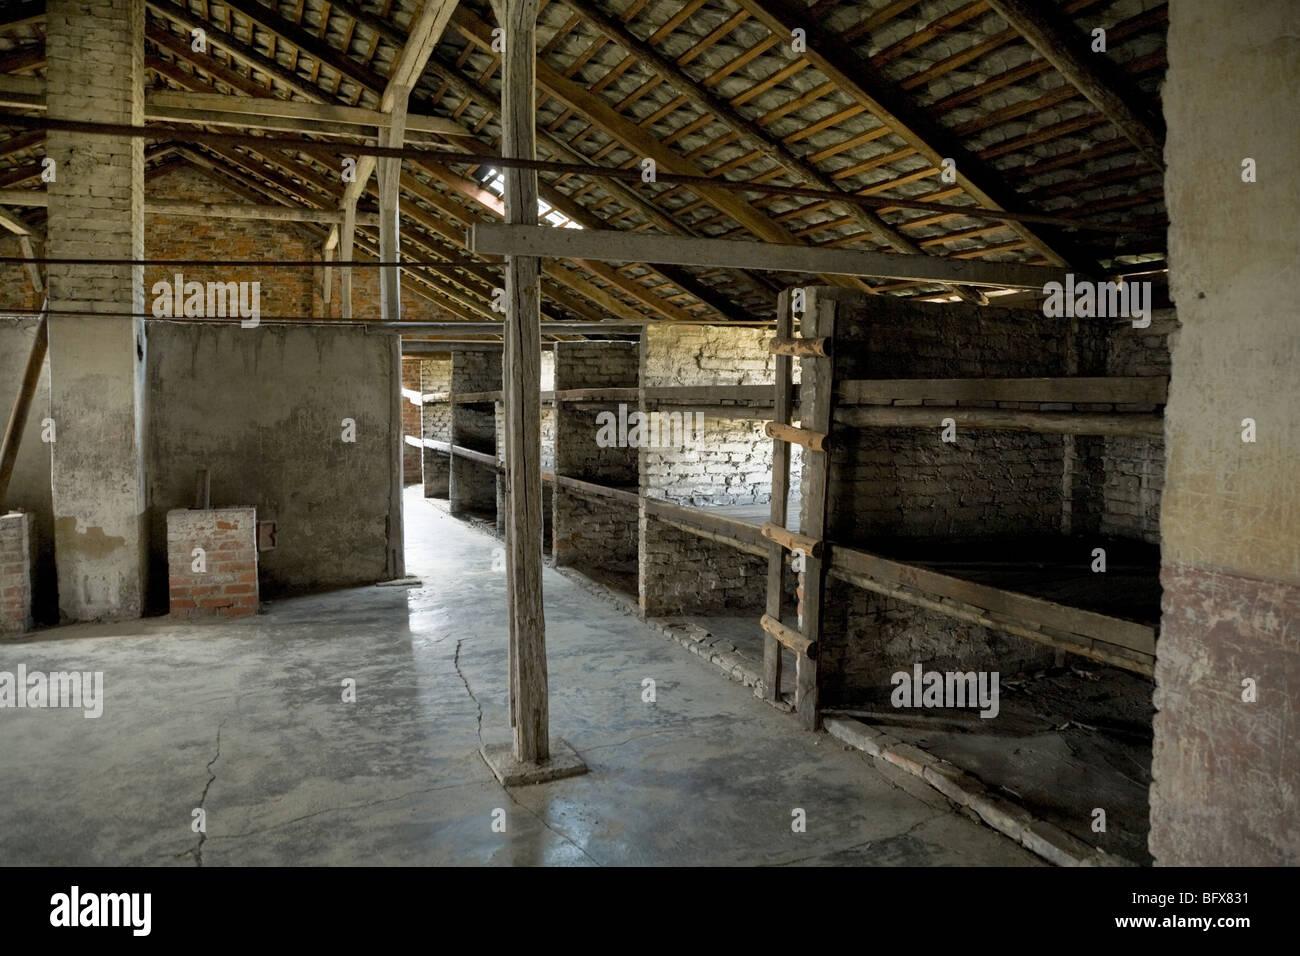 Bunks for prisoners inside a hut (number 3)/ shed of the Birkenau (Auschwitz II - Birkenau) Nazi death camp in Oswiecim, - Stock Image